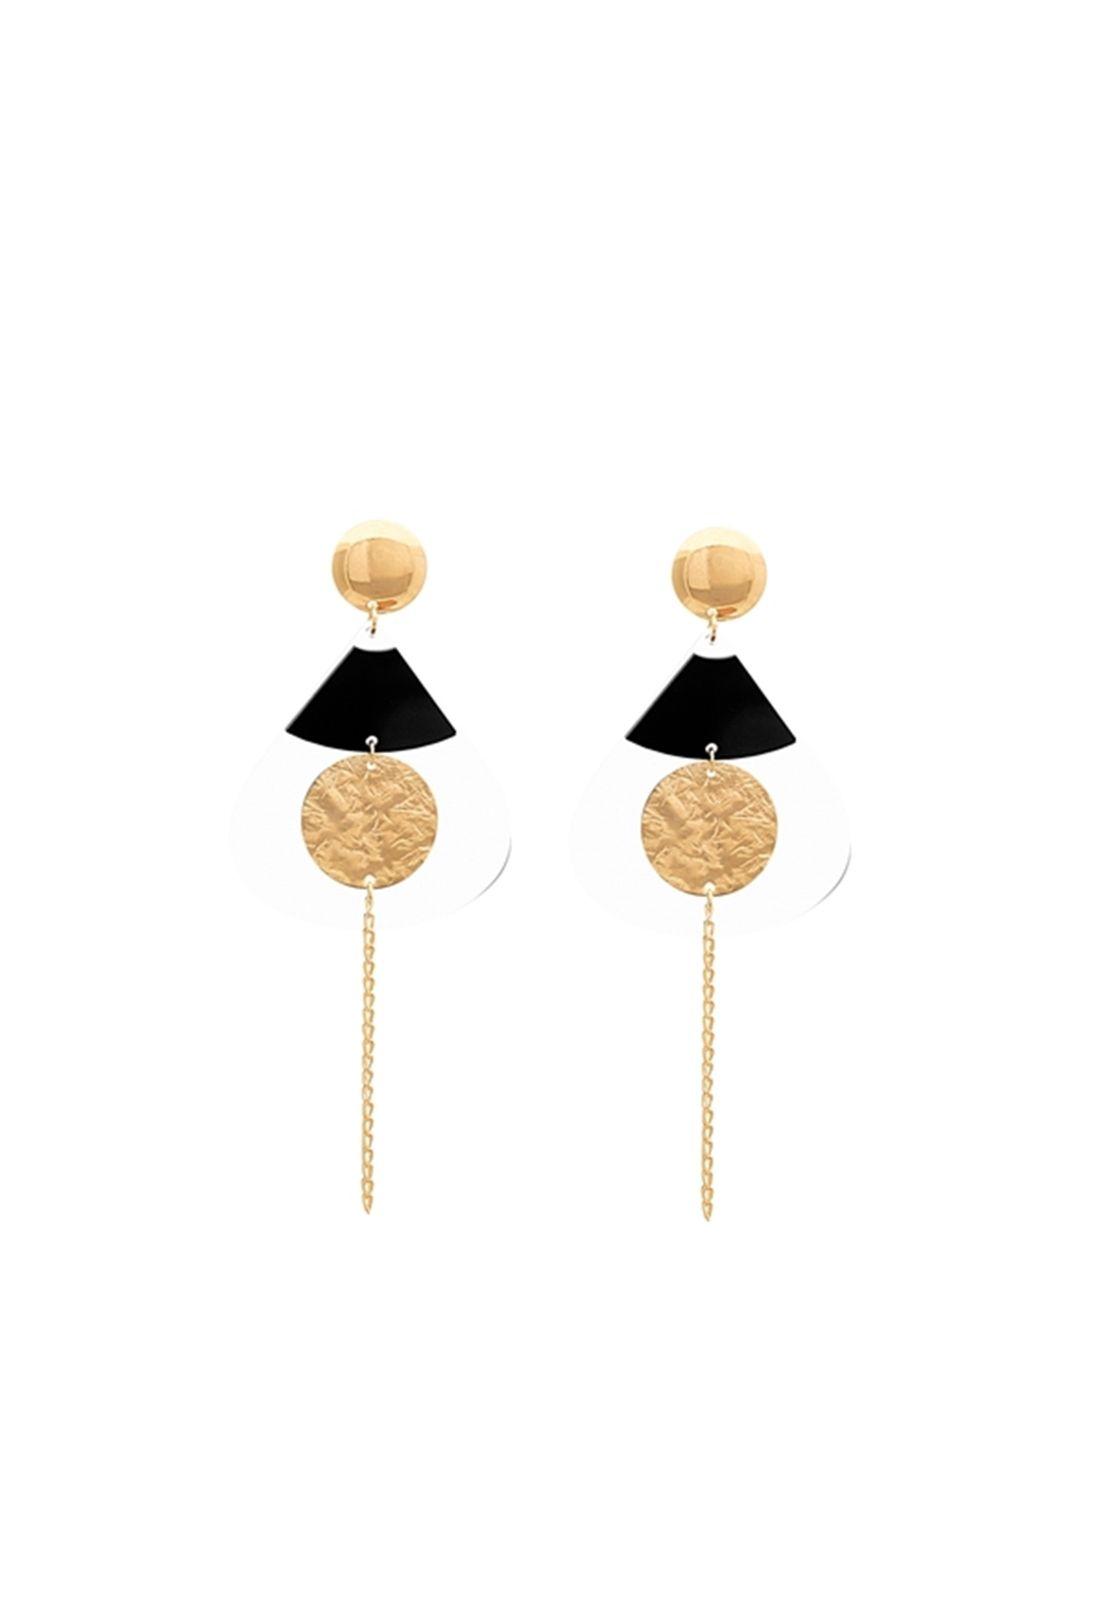 Brinco Le Diamond Formas Geométricas Dourado